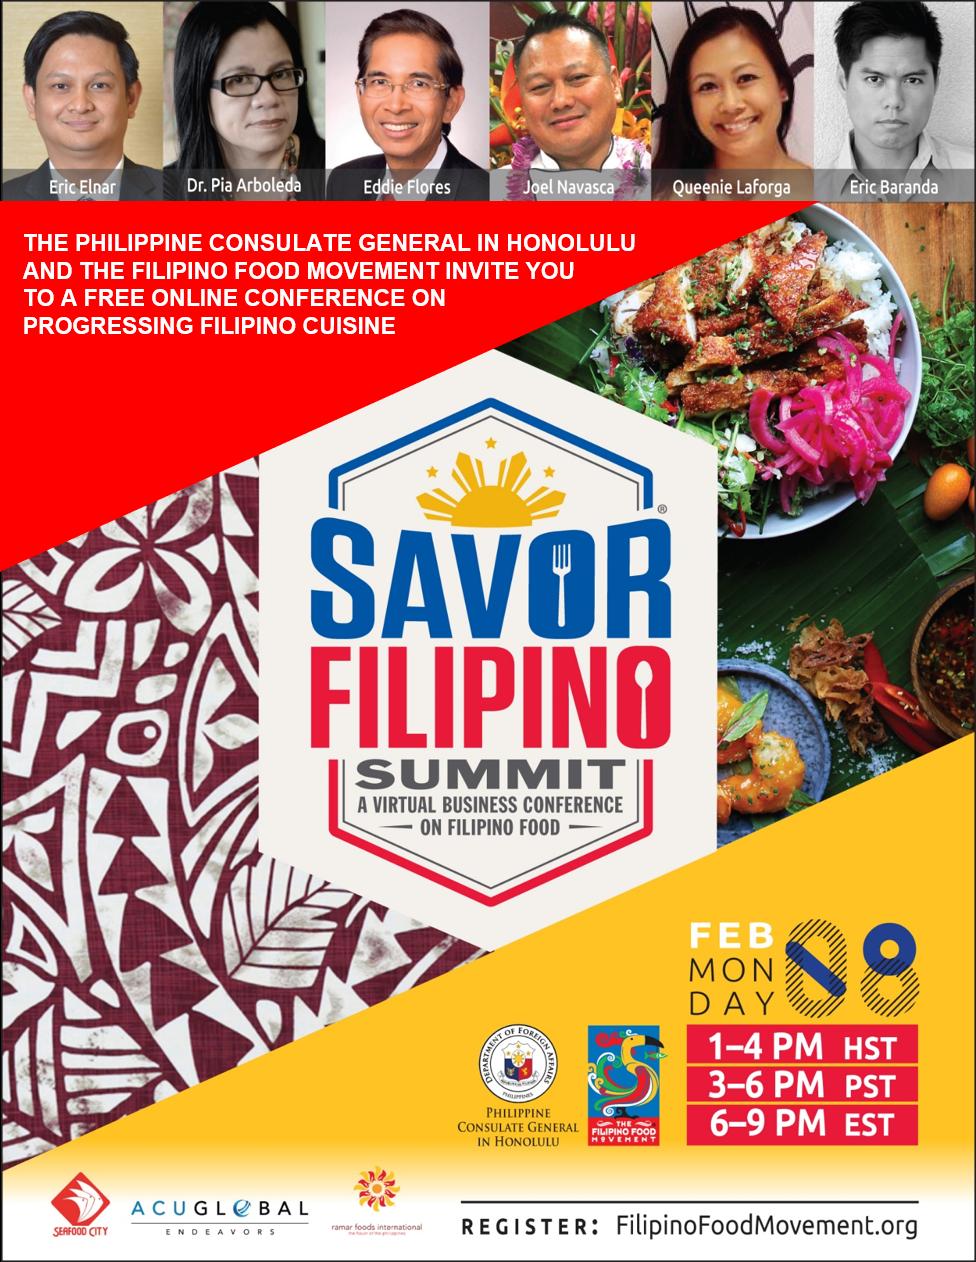 savor-filipino-summit